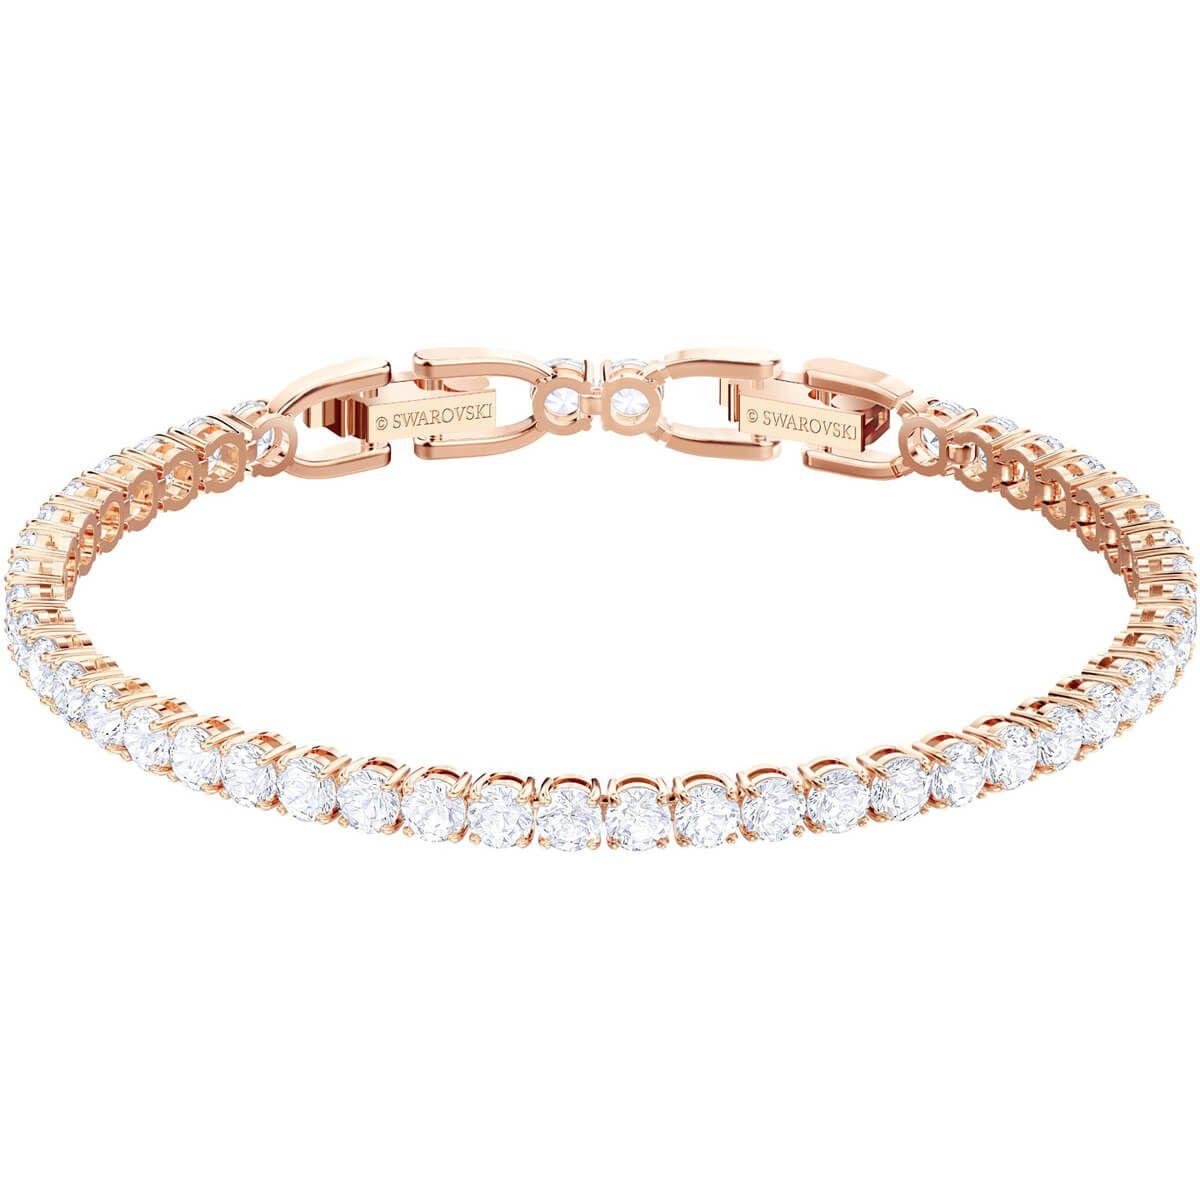 Tennis Deluxe Bracelet Gray Ruthenium Plated By Swarovski Diamond Bracelet Design Swarovski Bracelet Gold Bracelet